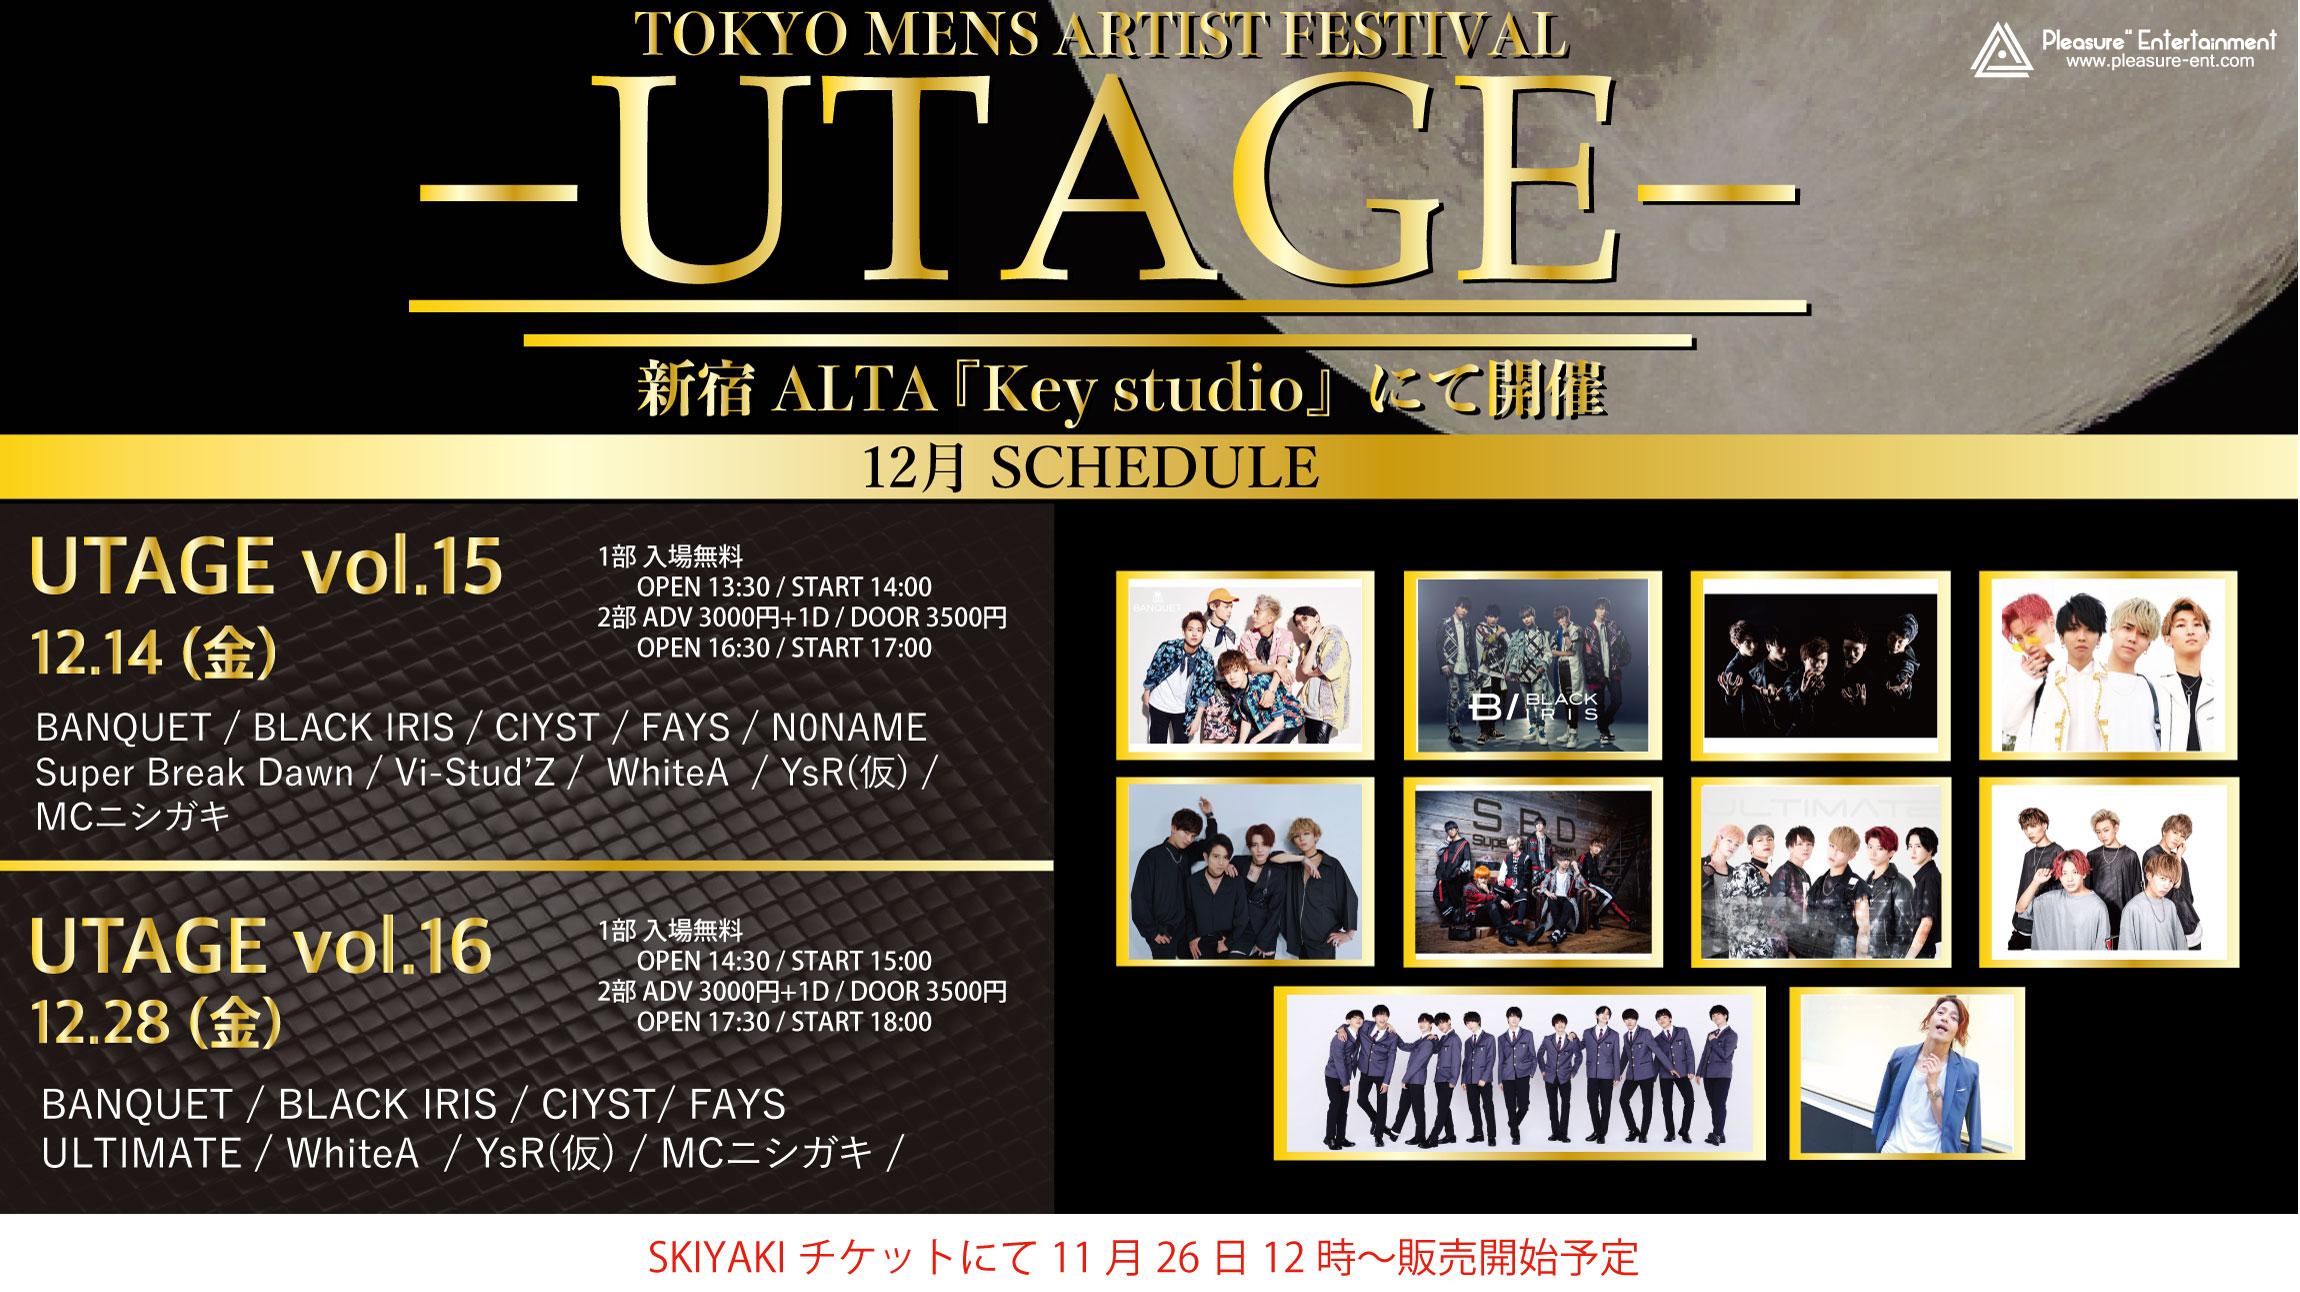 -UTAGE vol.15- ~ Tokyo Mens Artist Festival ~